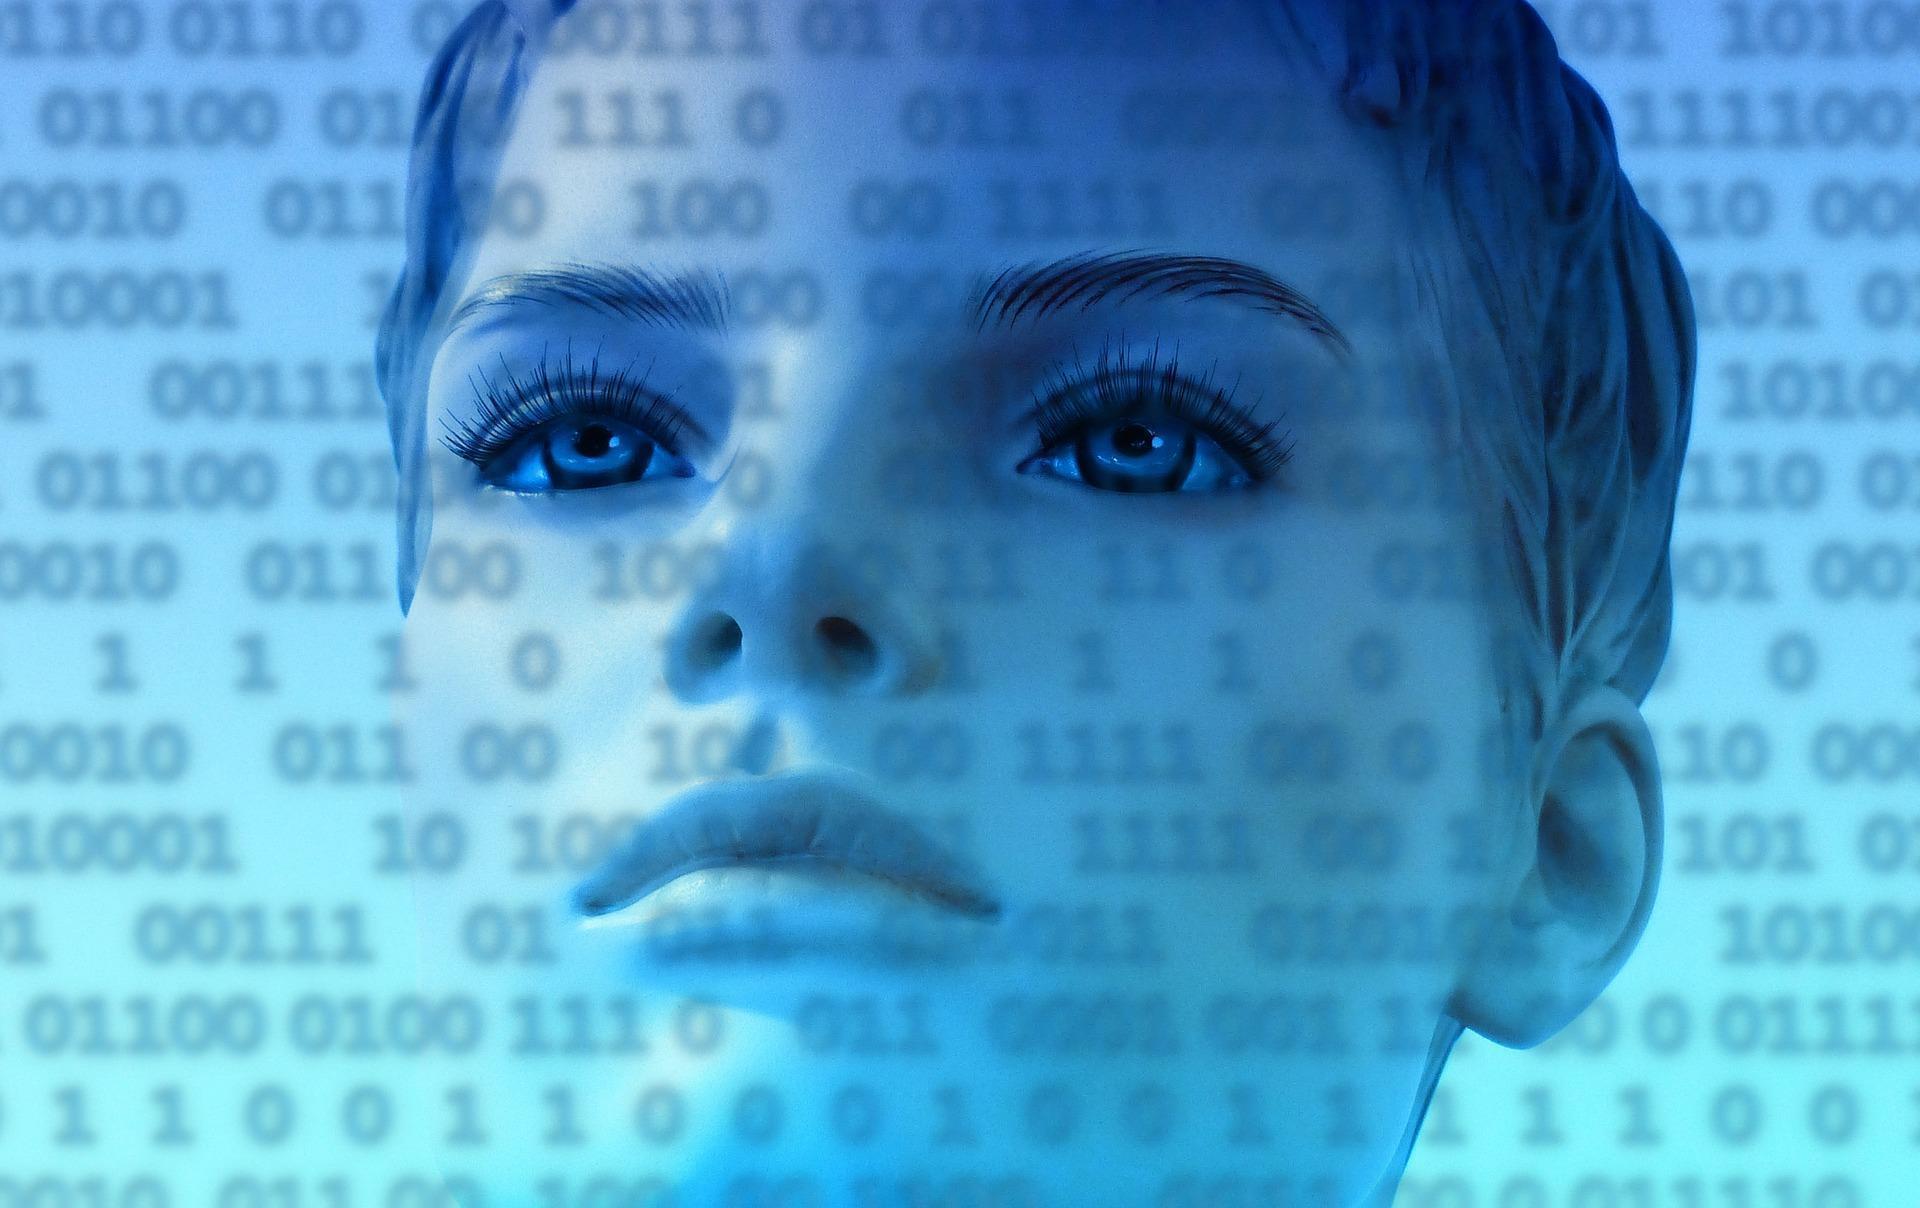 binary-wallpaper-code-HD